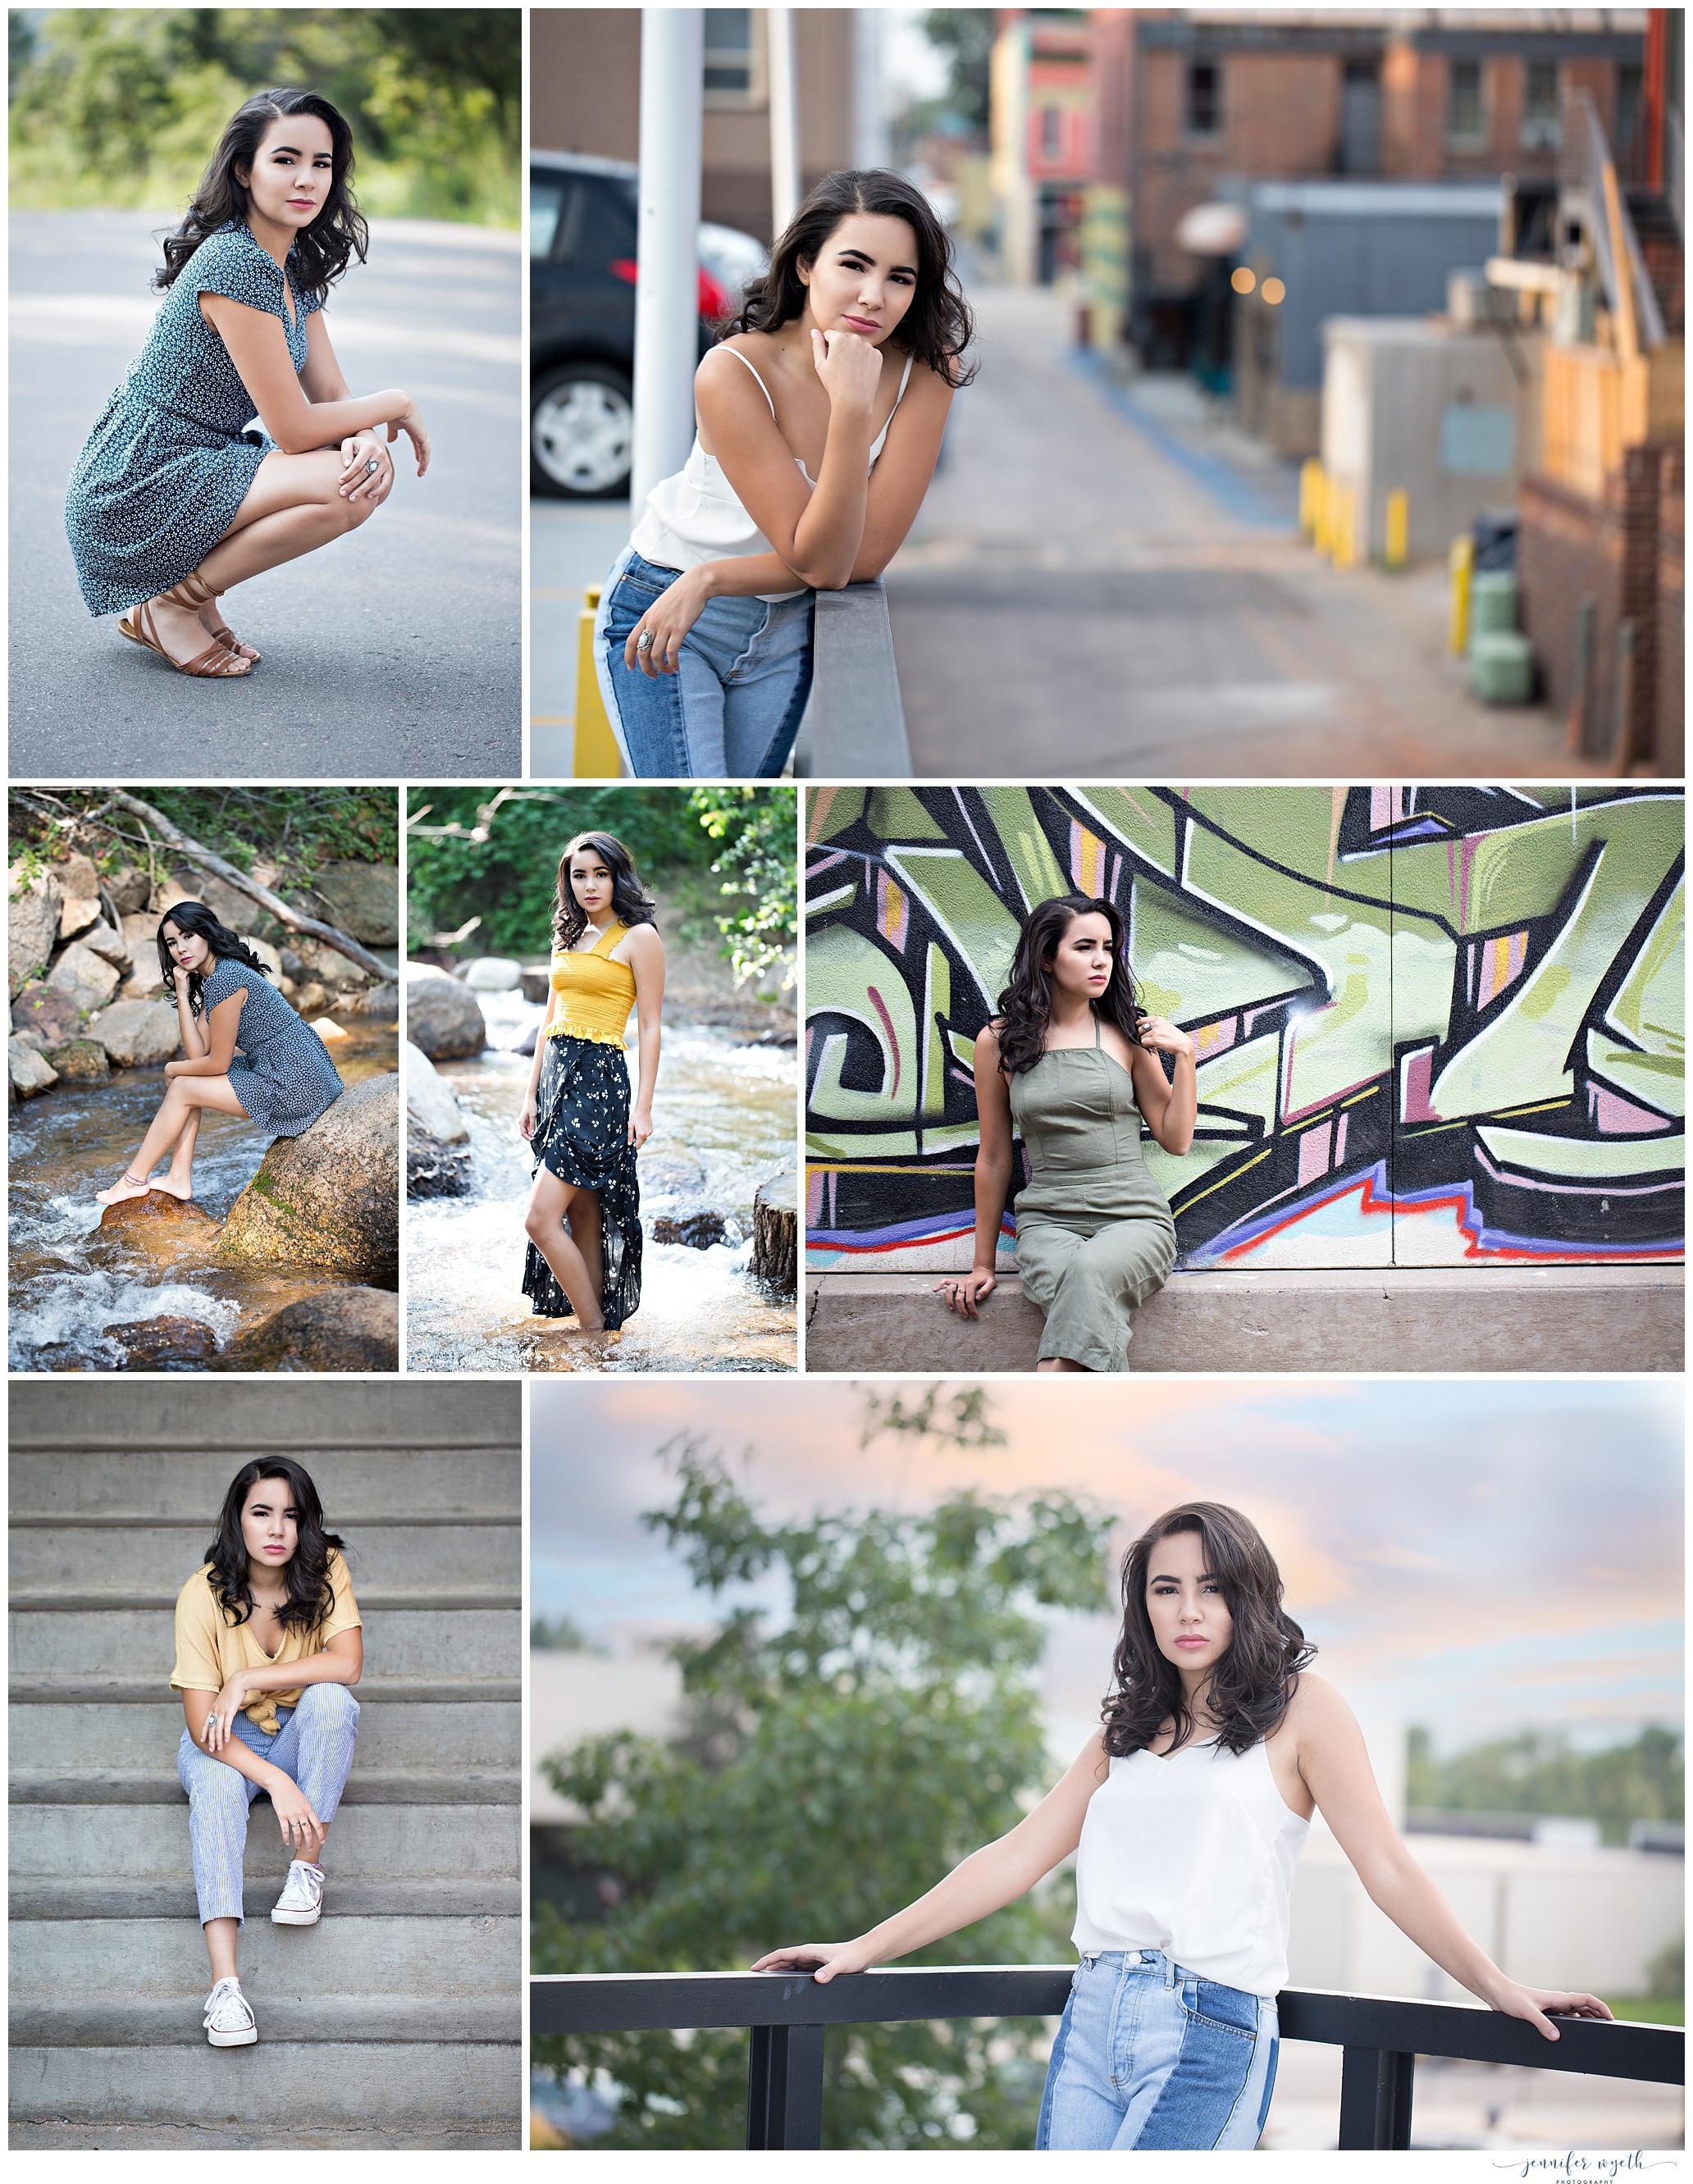 Jennifer-Wyeth-photography-senior-pictures-colorado-springs-photographer_0238.jpg